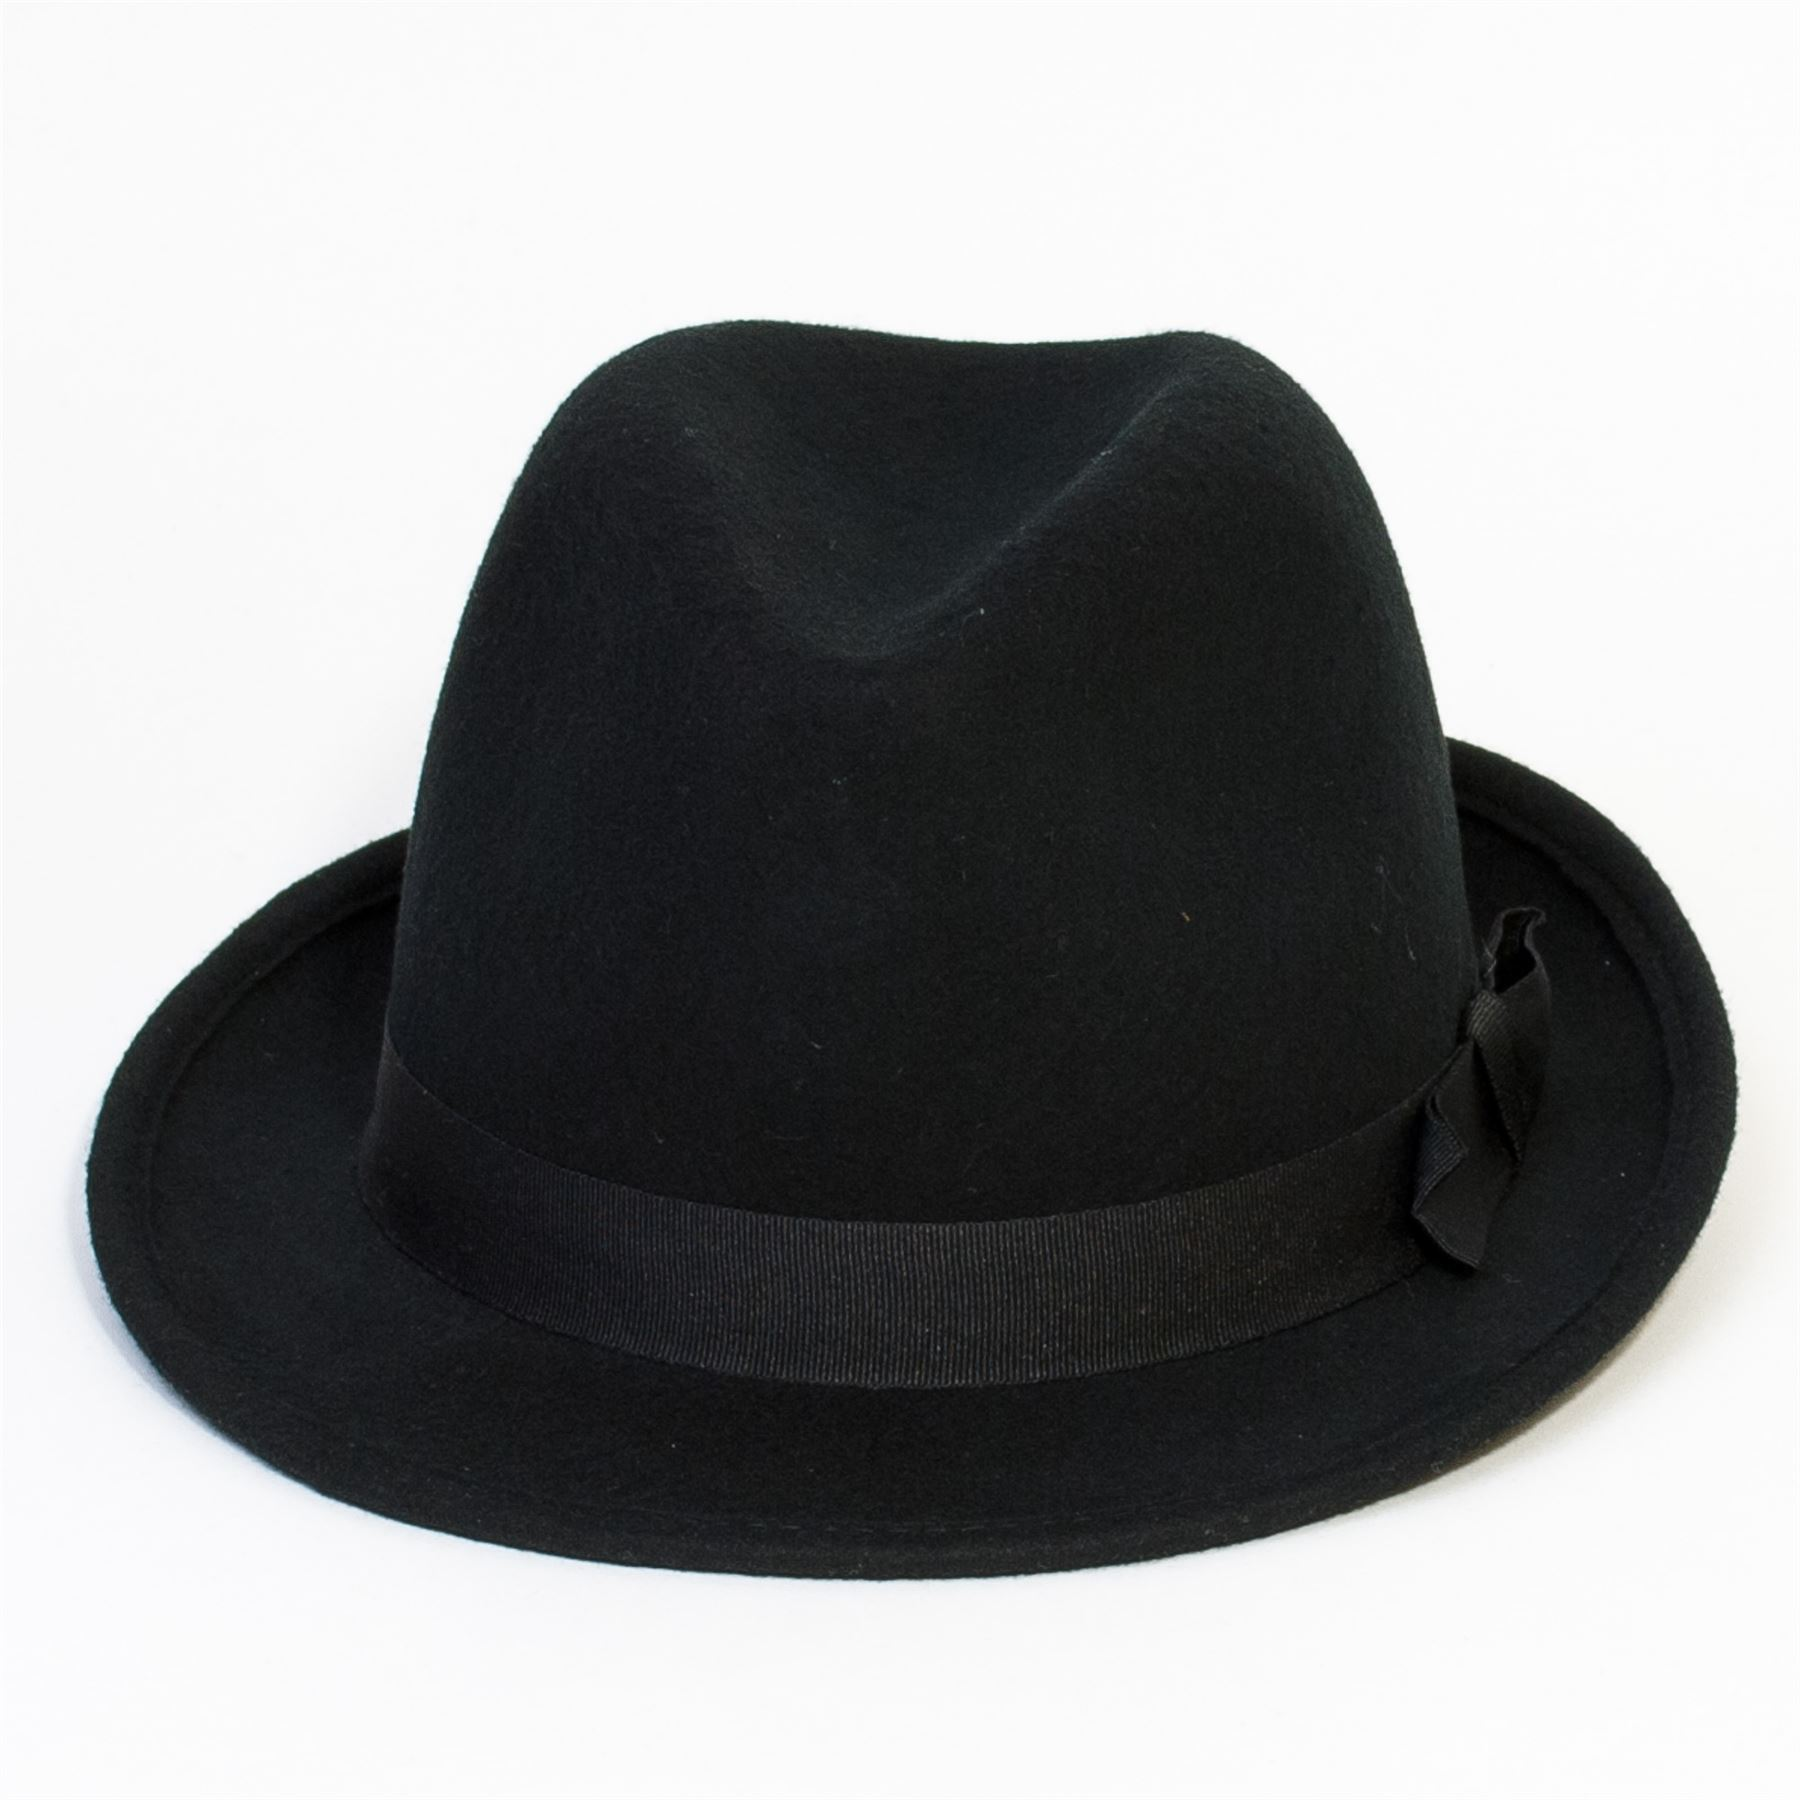 97528c69e3b Black Felt Trilby Hat with Grosgrain Ribbon